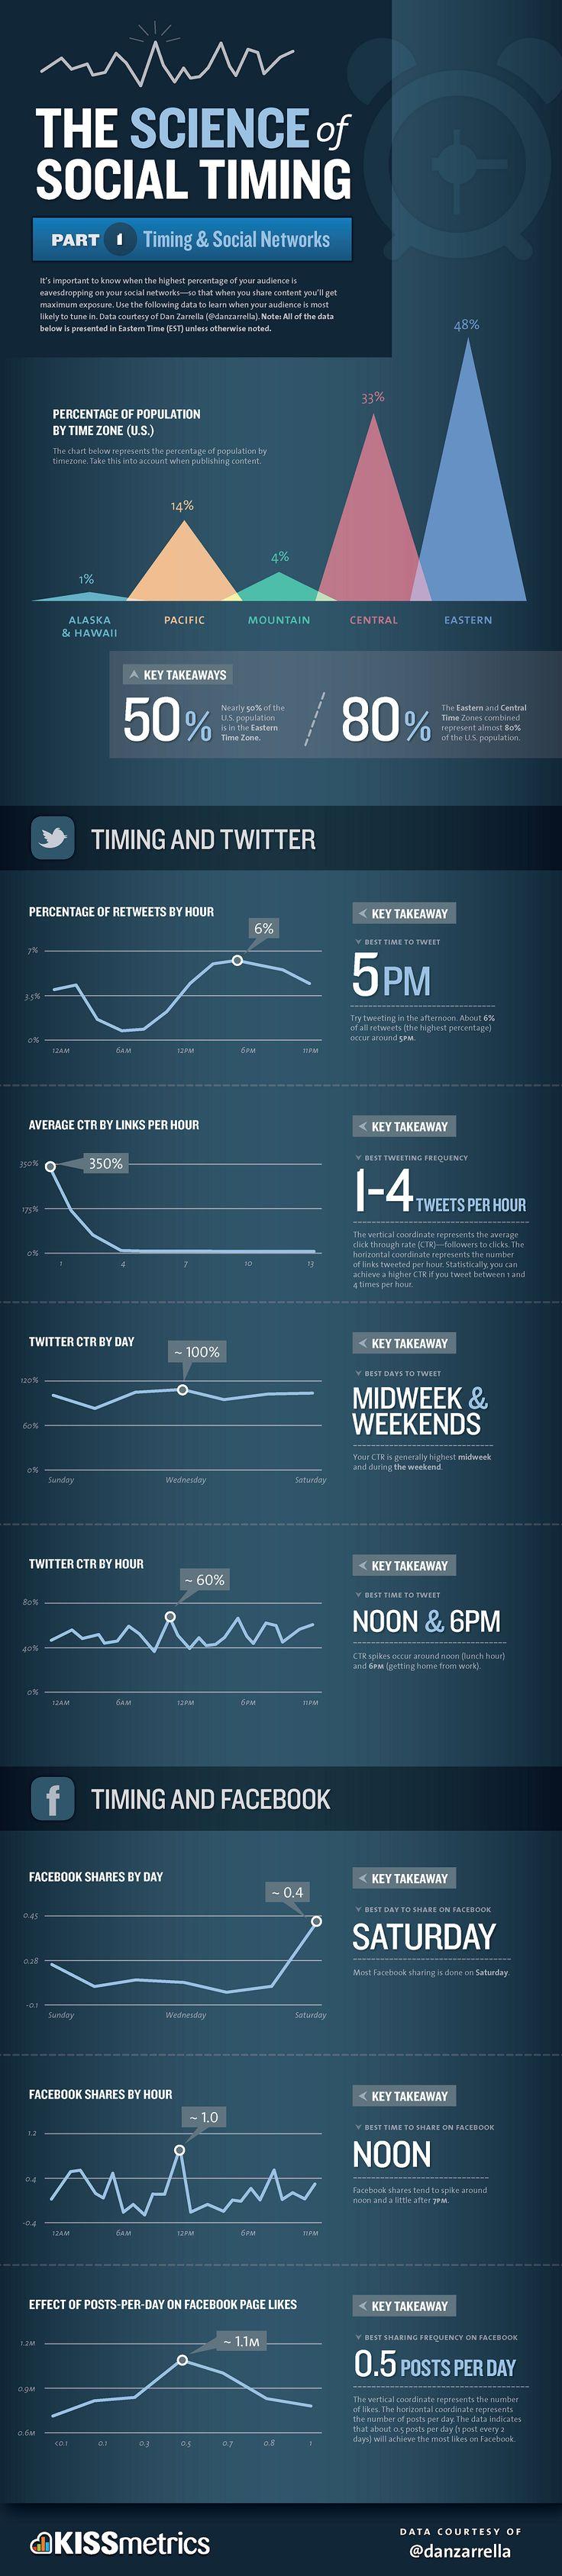 Science of social timingData Collection, Social Network, Internet Marketing, Blog Tips, Social Media, Graphics Design, Social Time, Infographic, Socialmedia